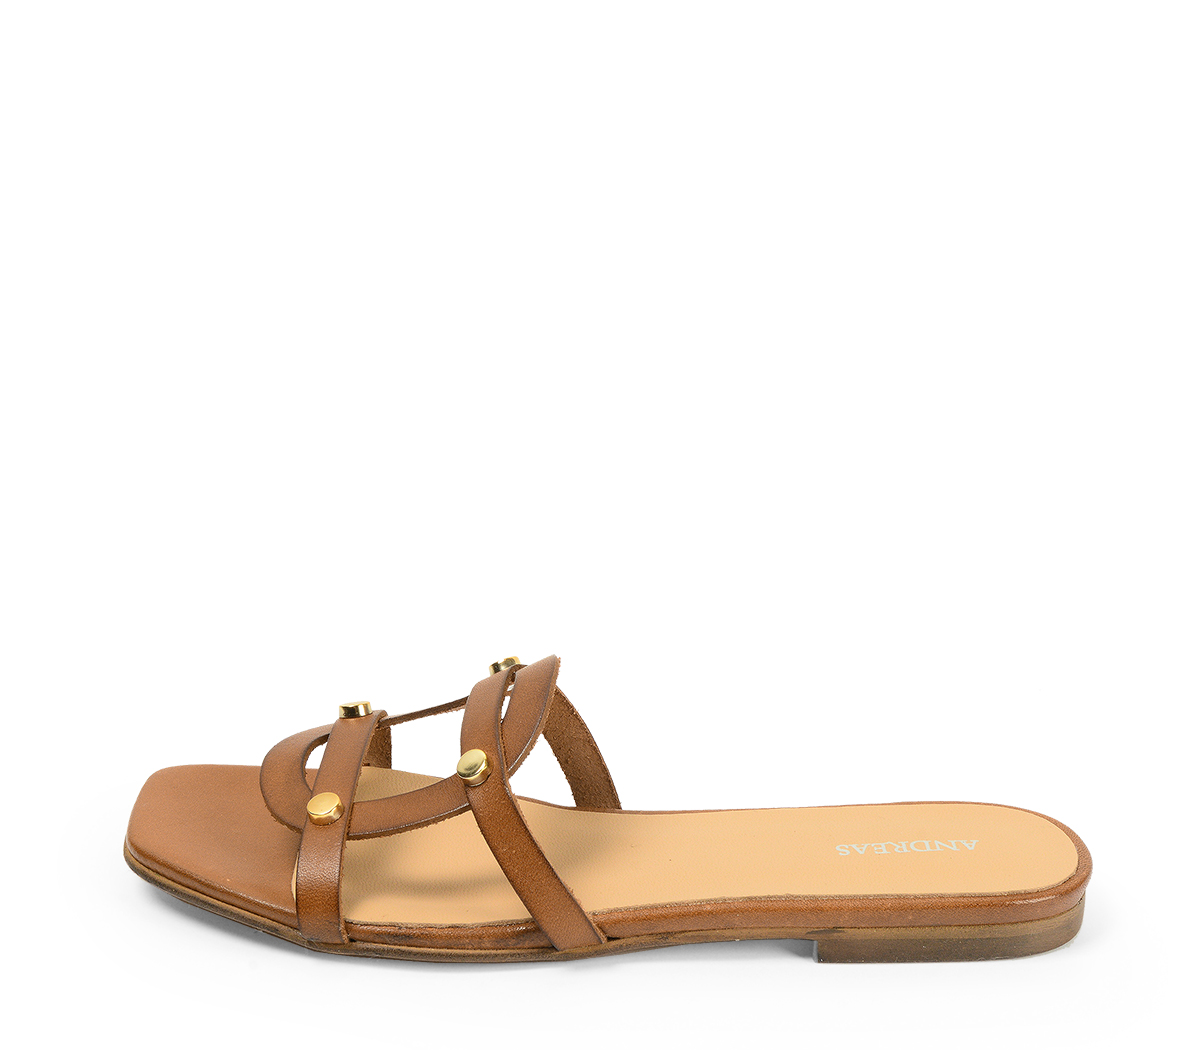 Sandalia plana piel cuero y tachas doradas